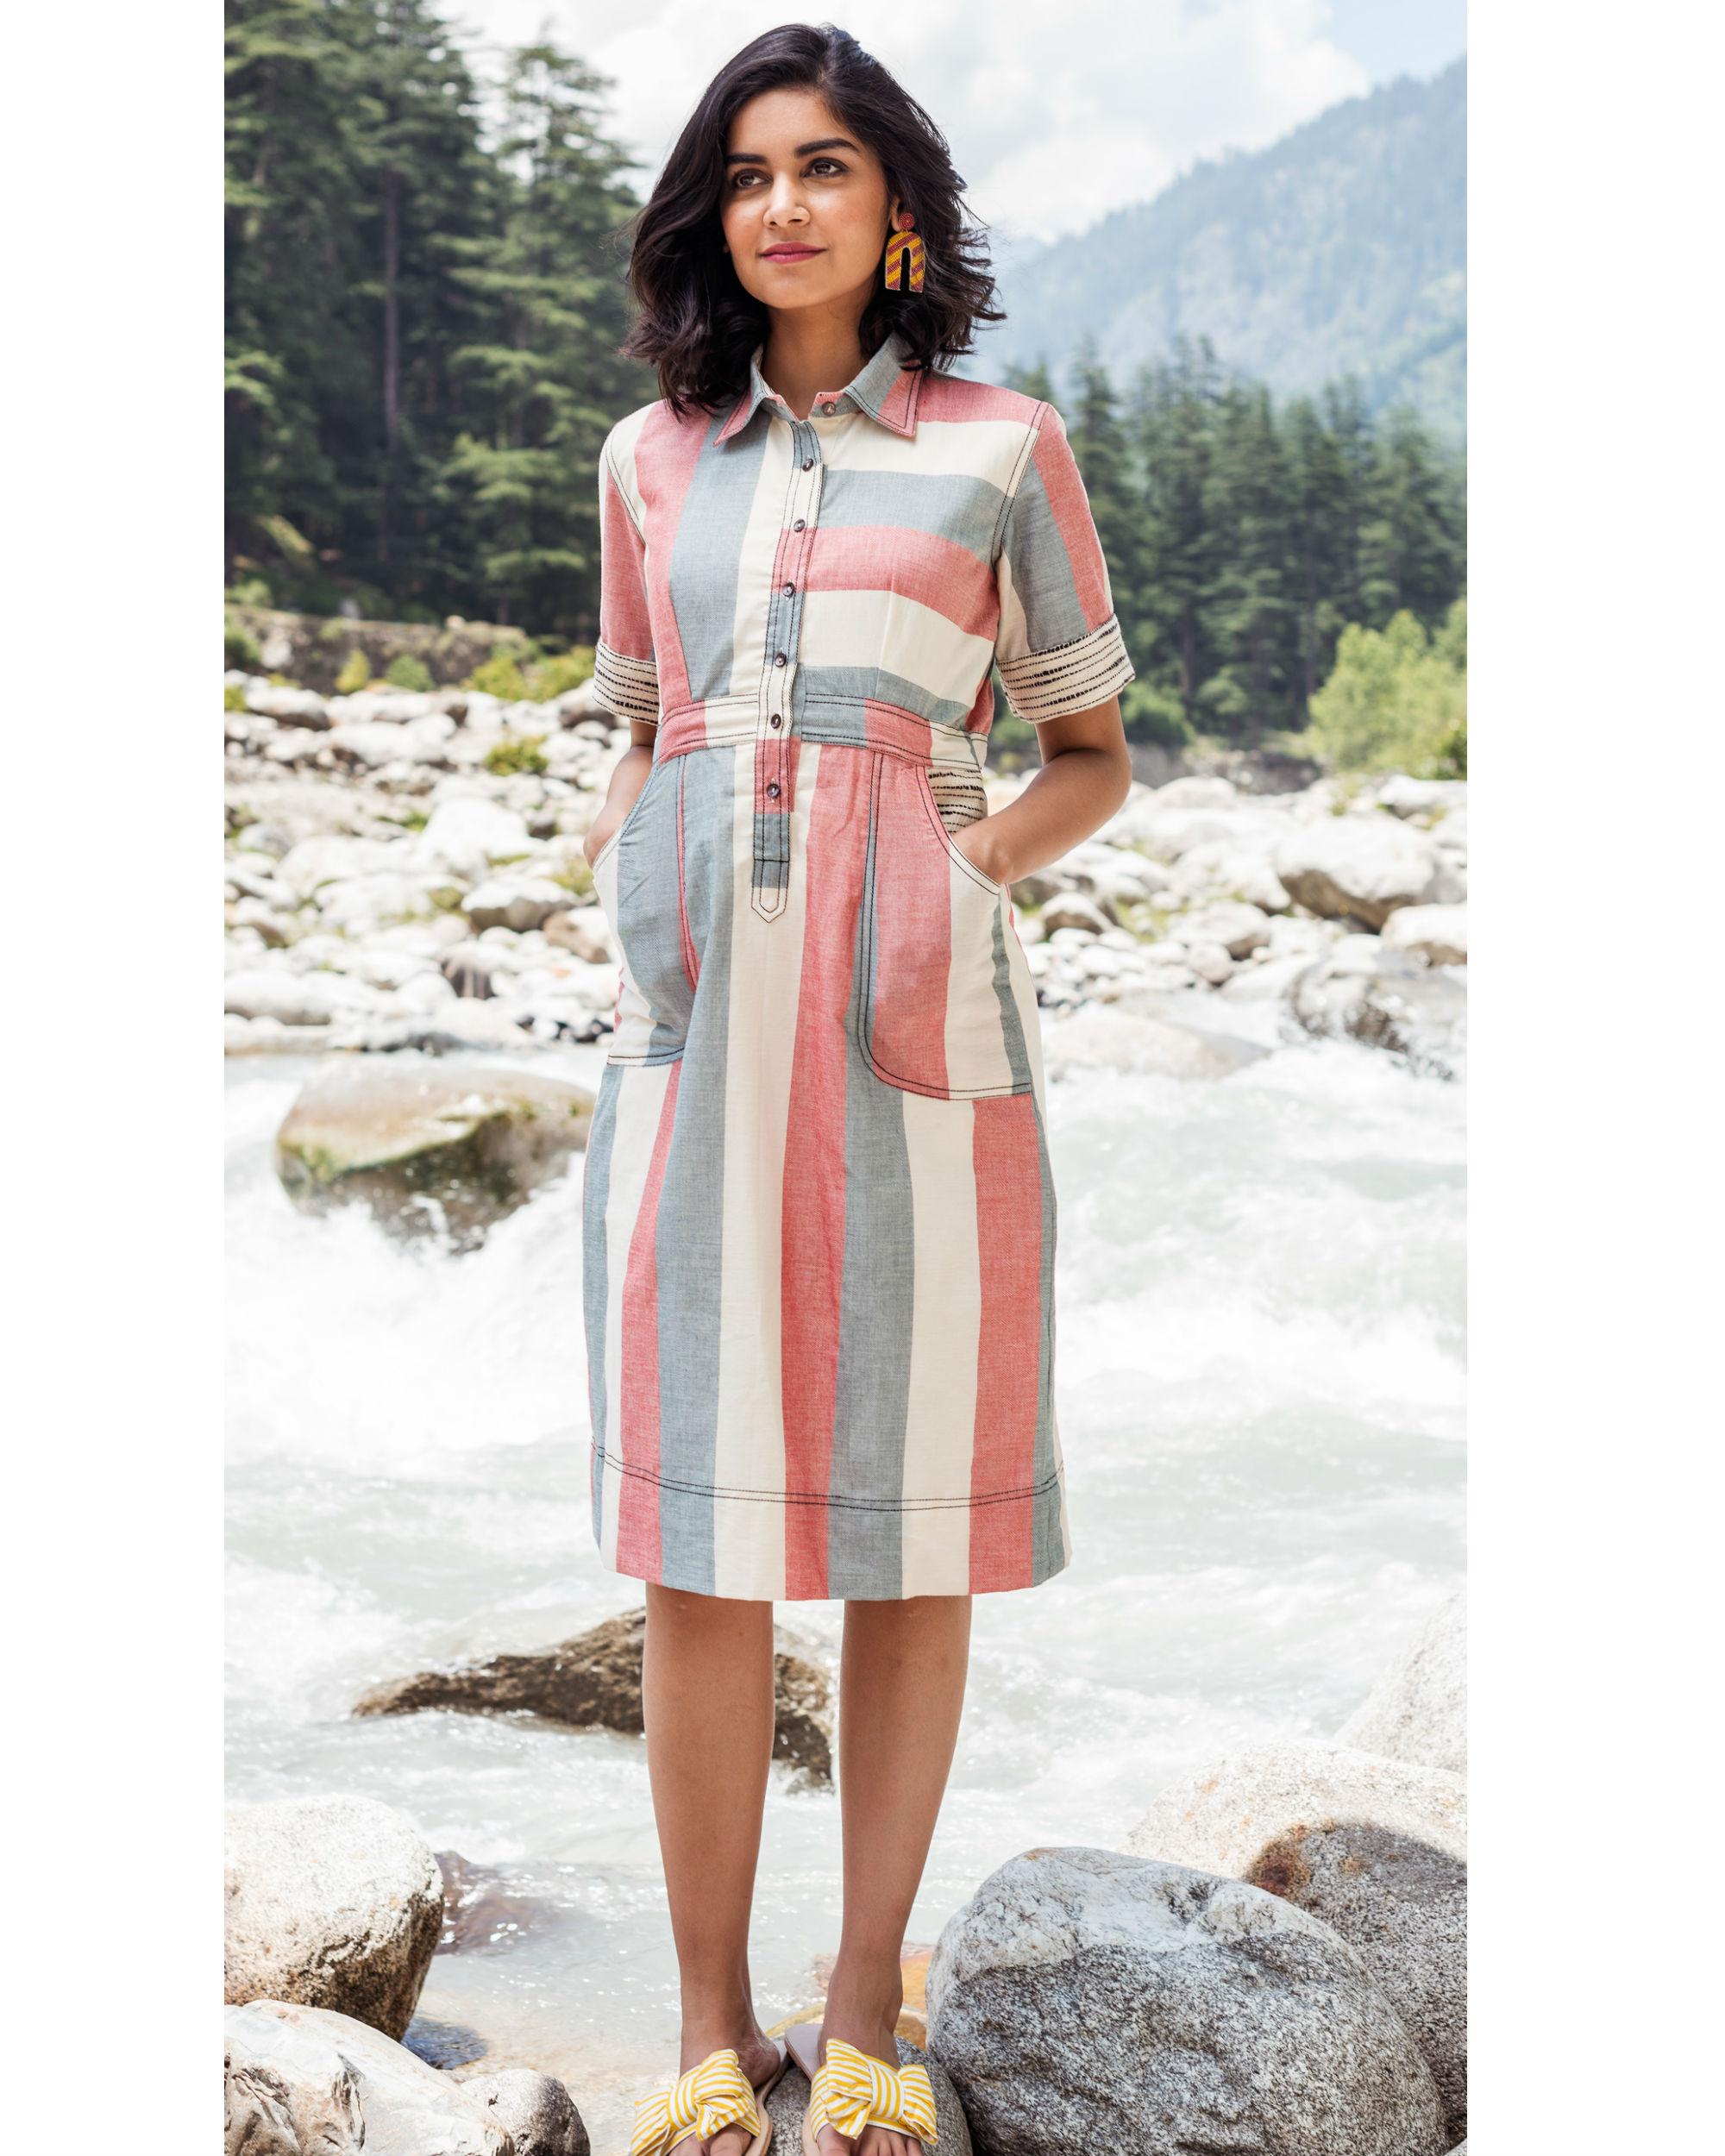 Rainforest striped dress